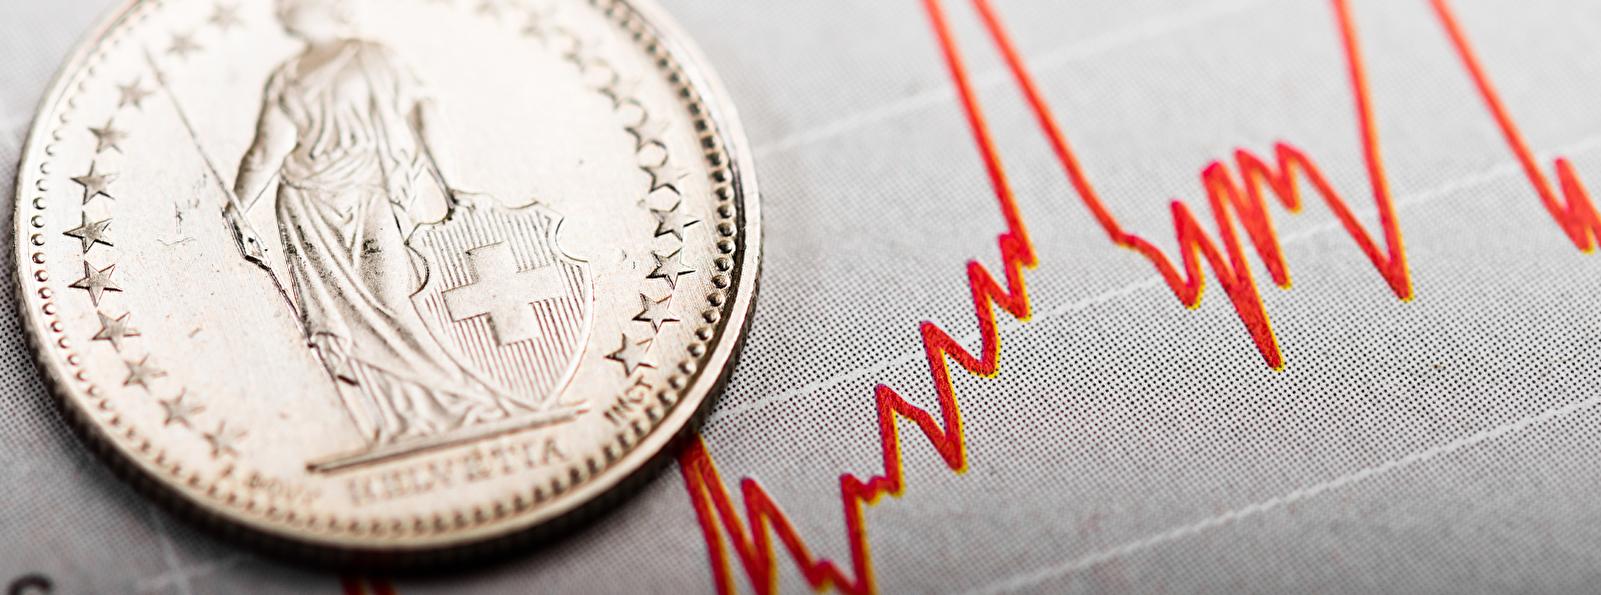 Bild zum Thema Finanzplanung